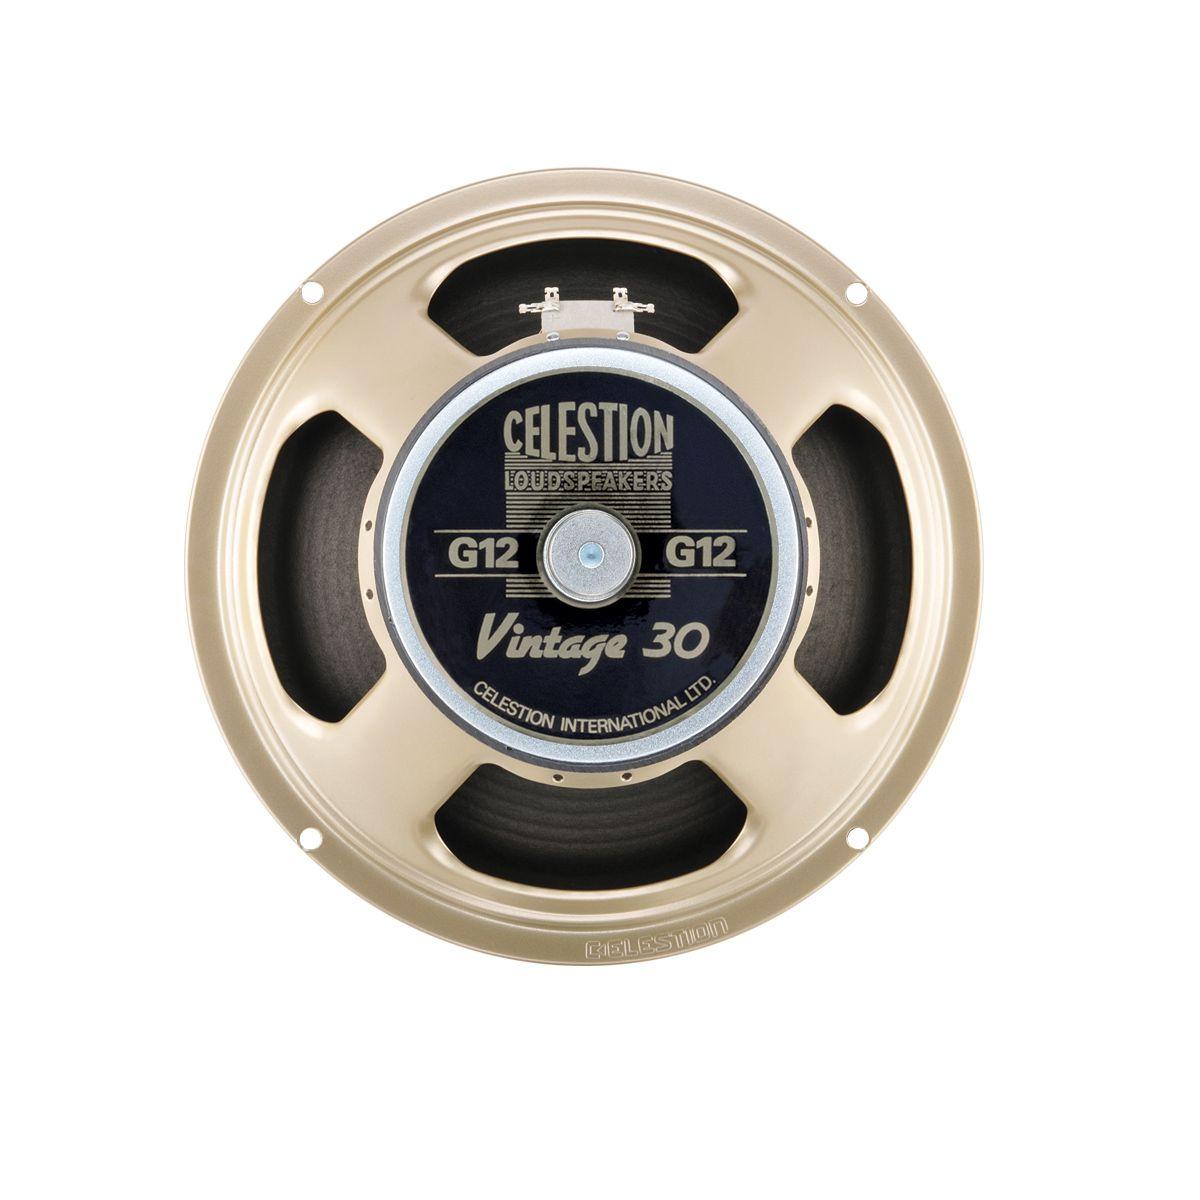 Alto Falante Celestion Vintage 30 12 60w Guitar Speaker